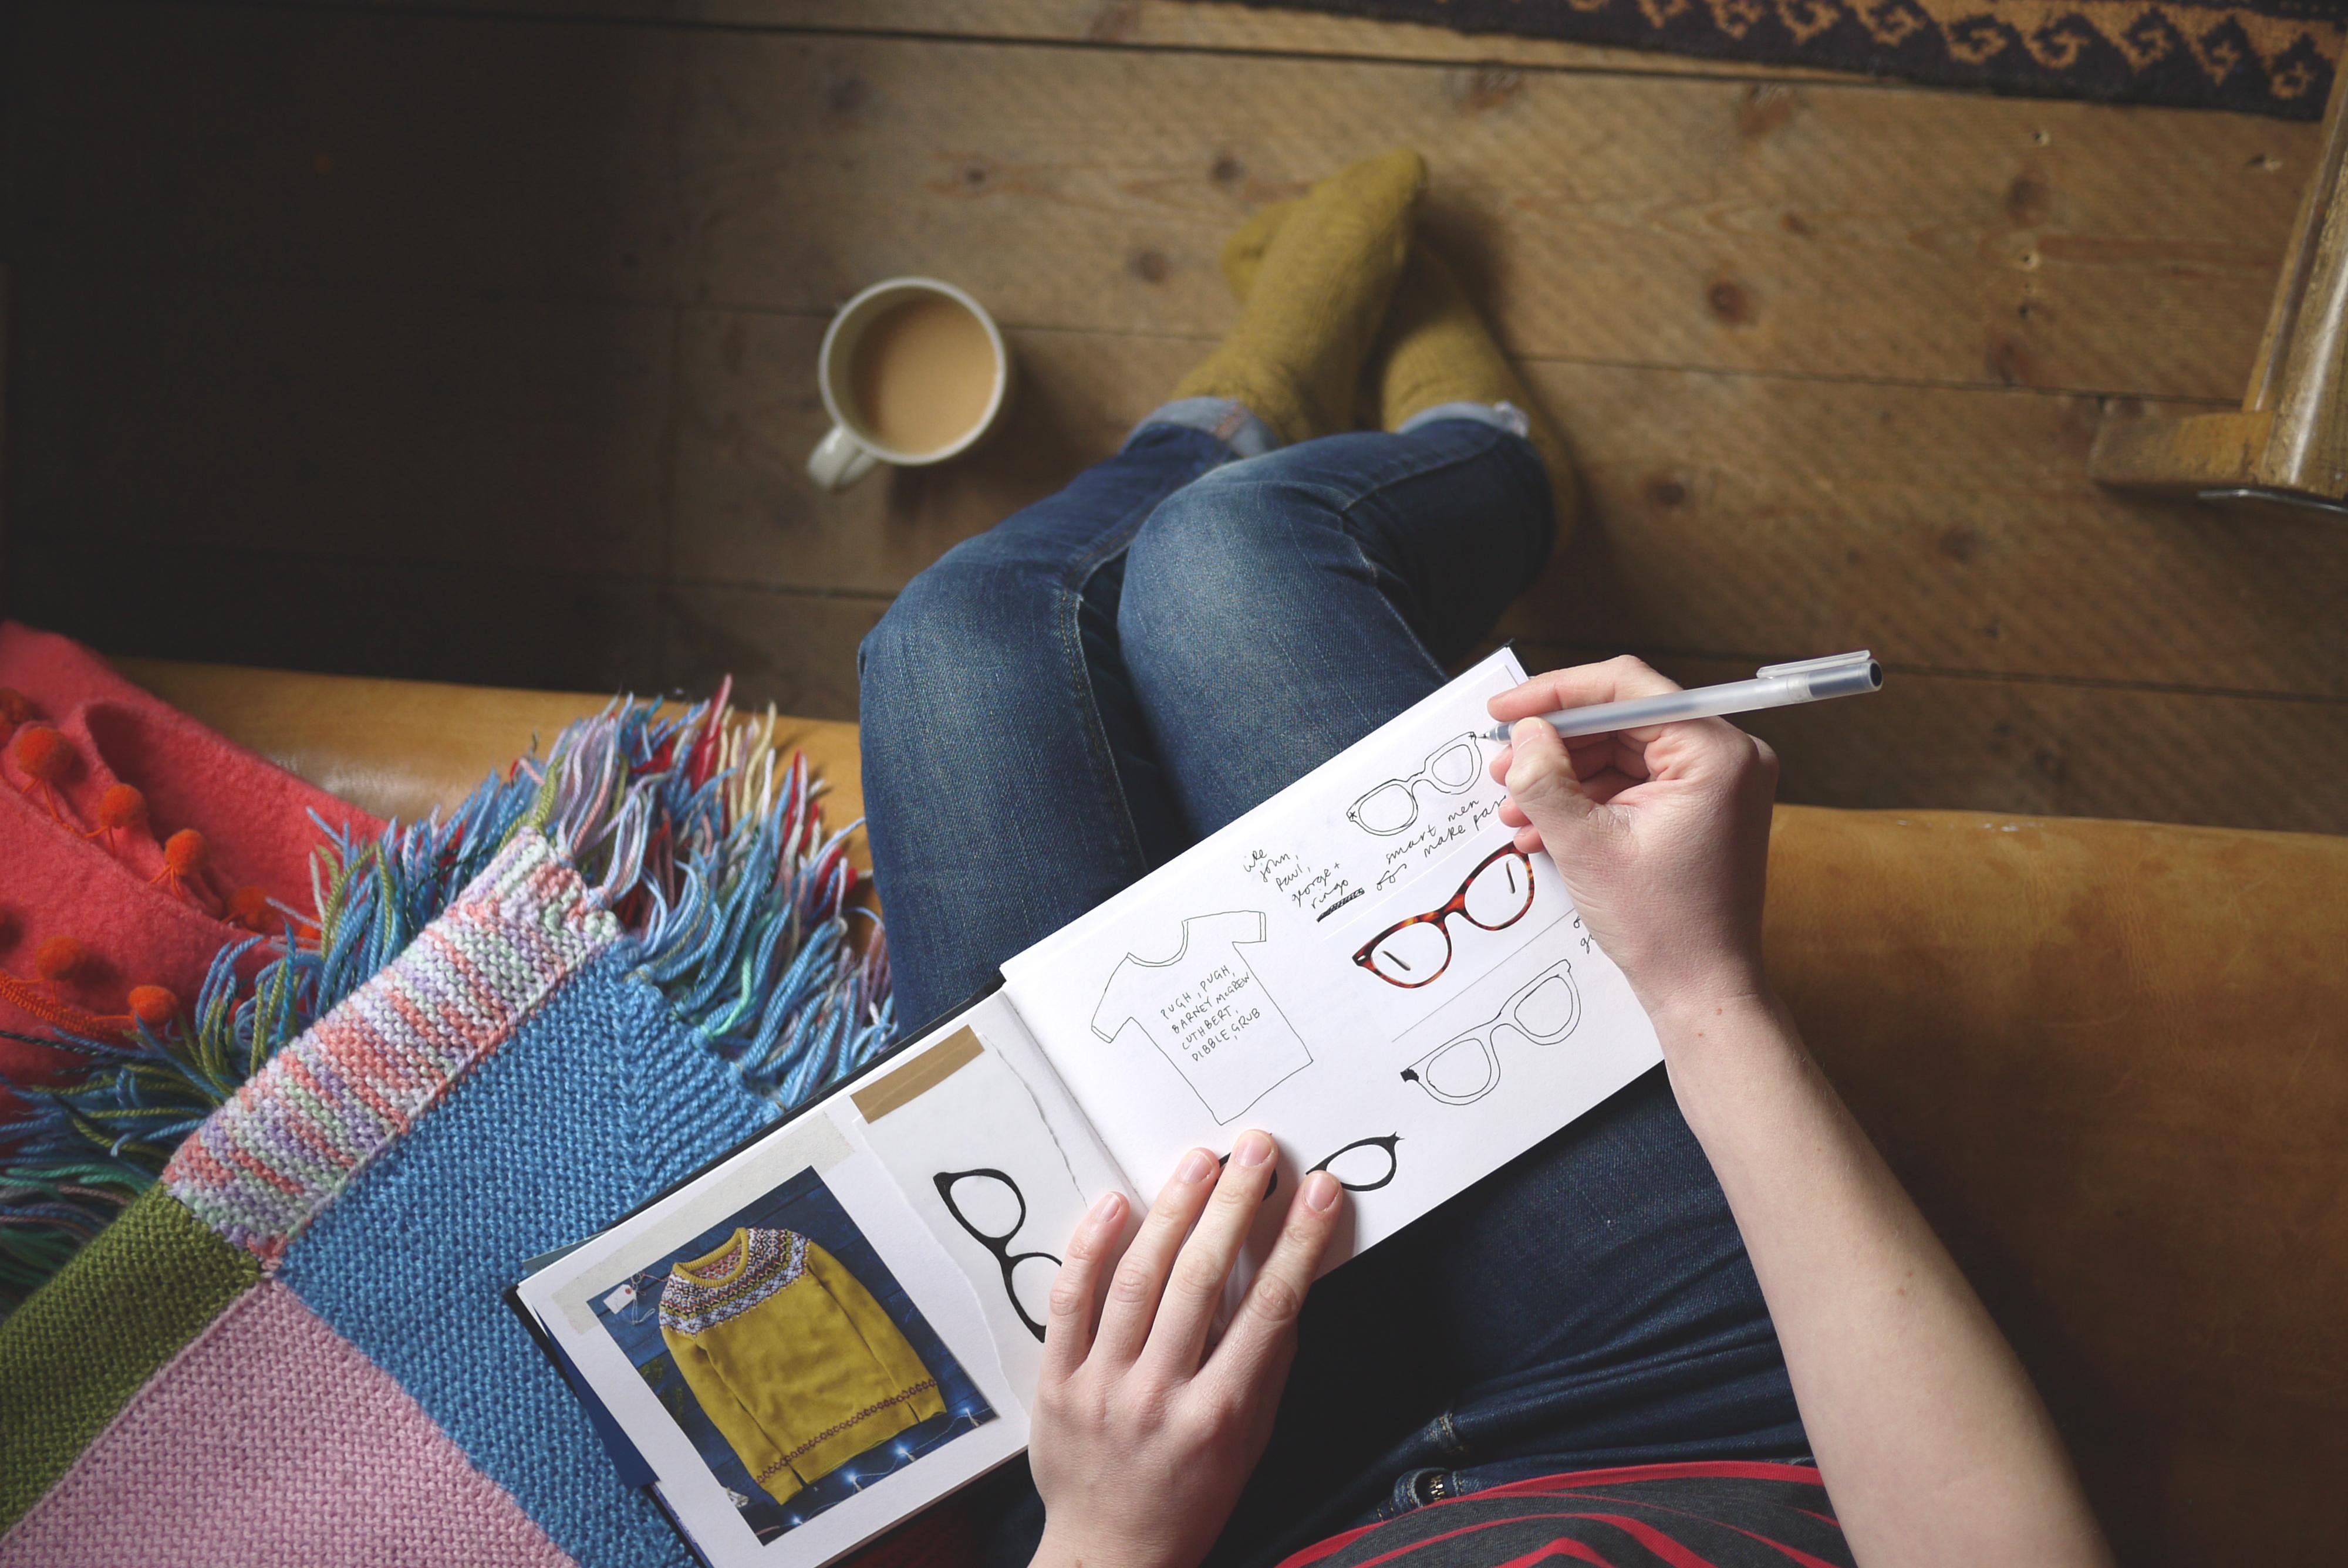 sianuska screenprinting, sketchbook